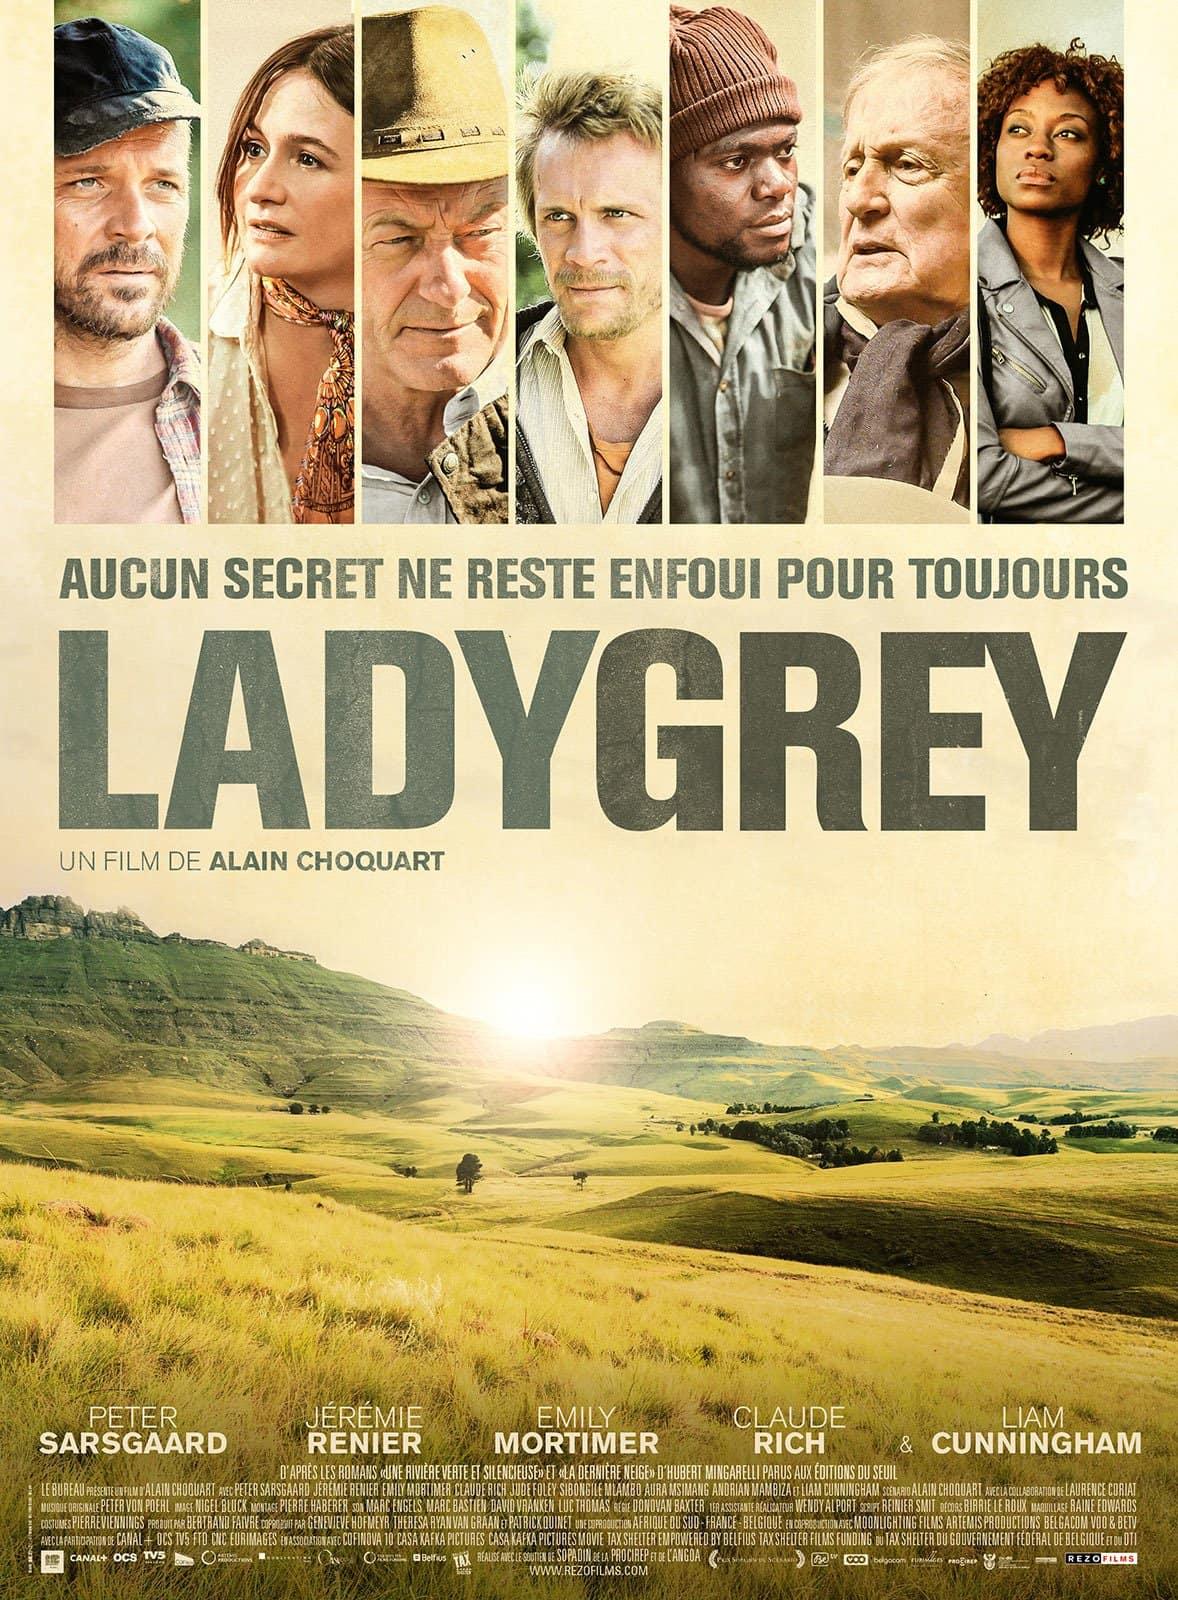 Ladygrey